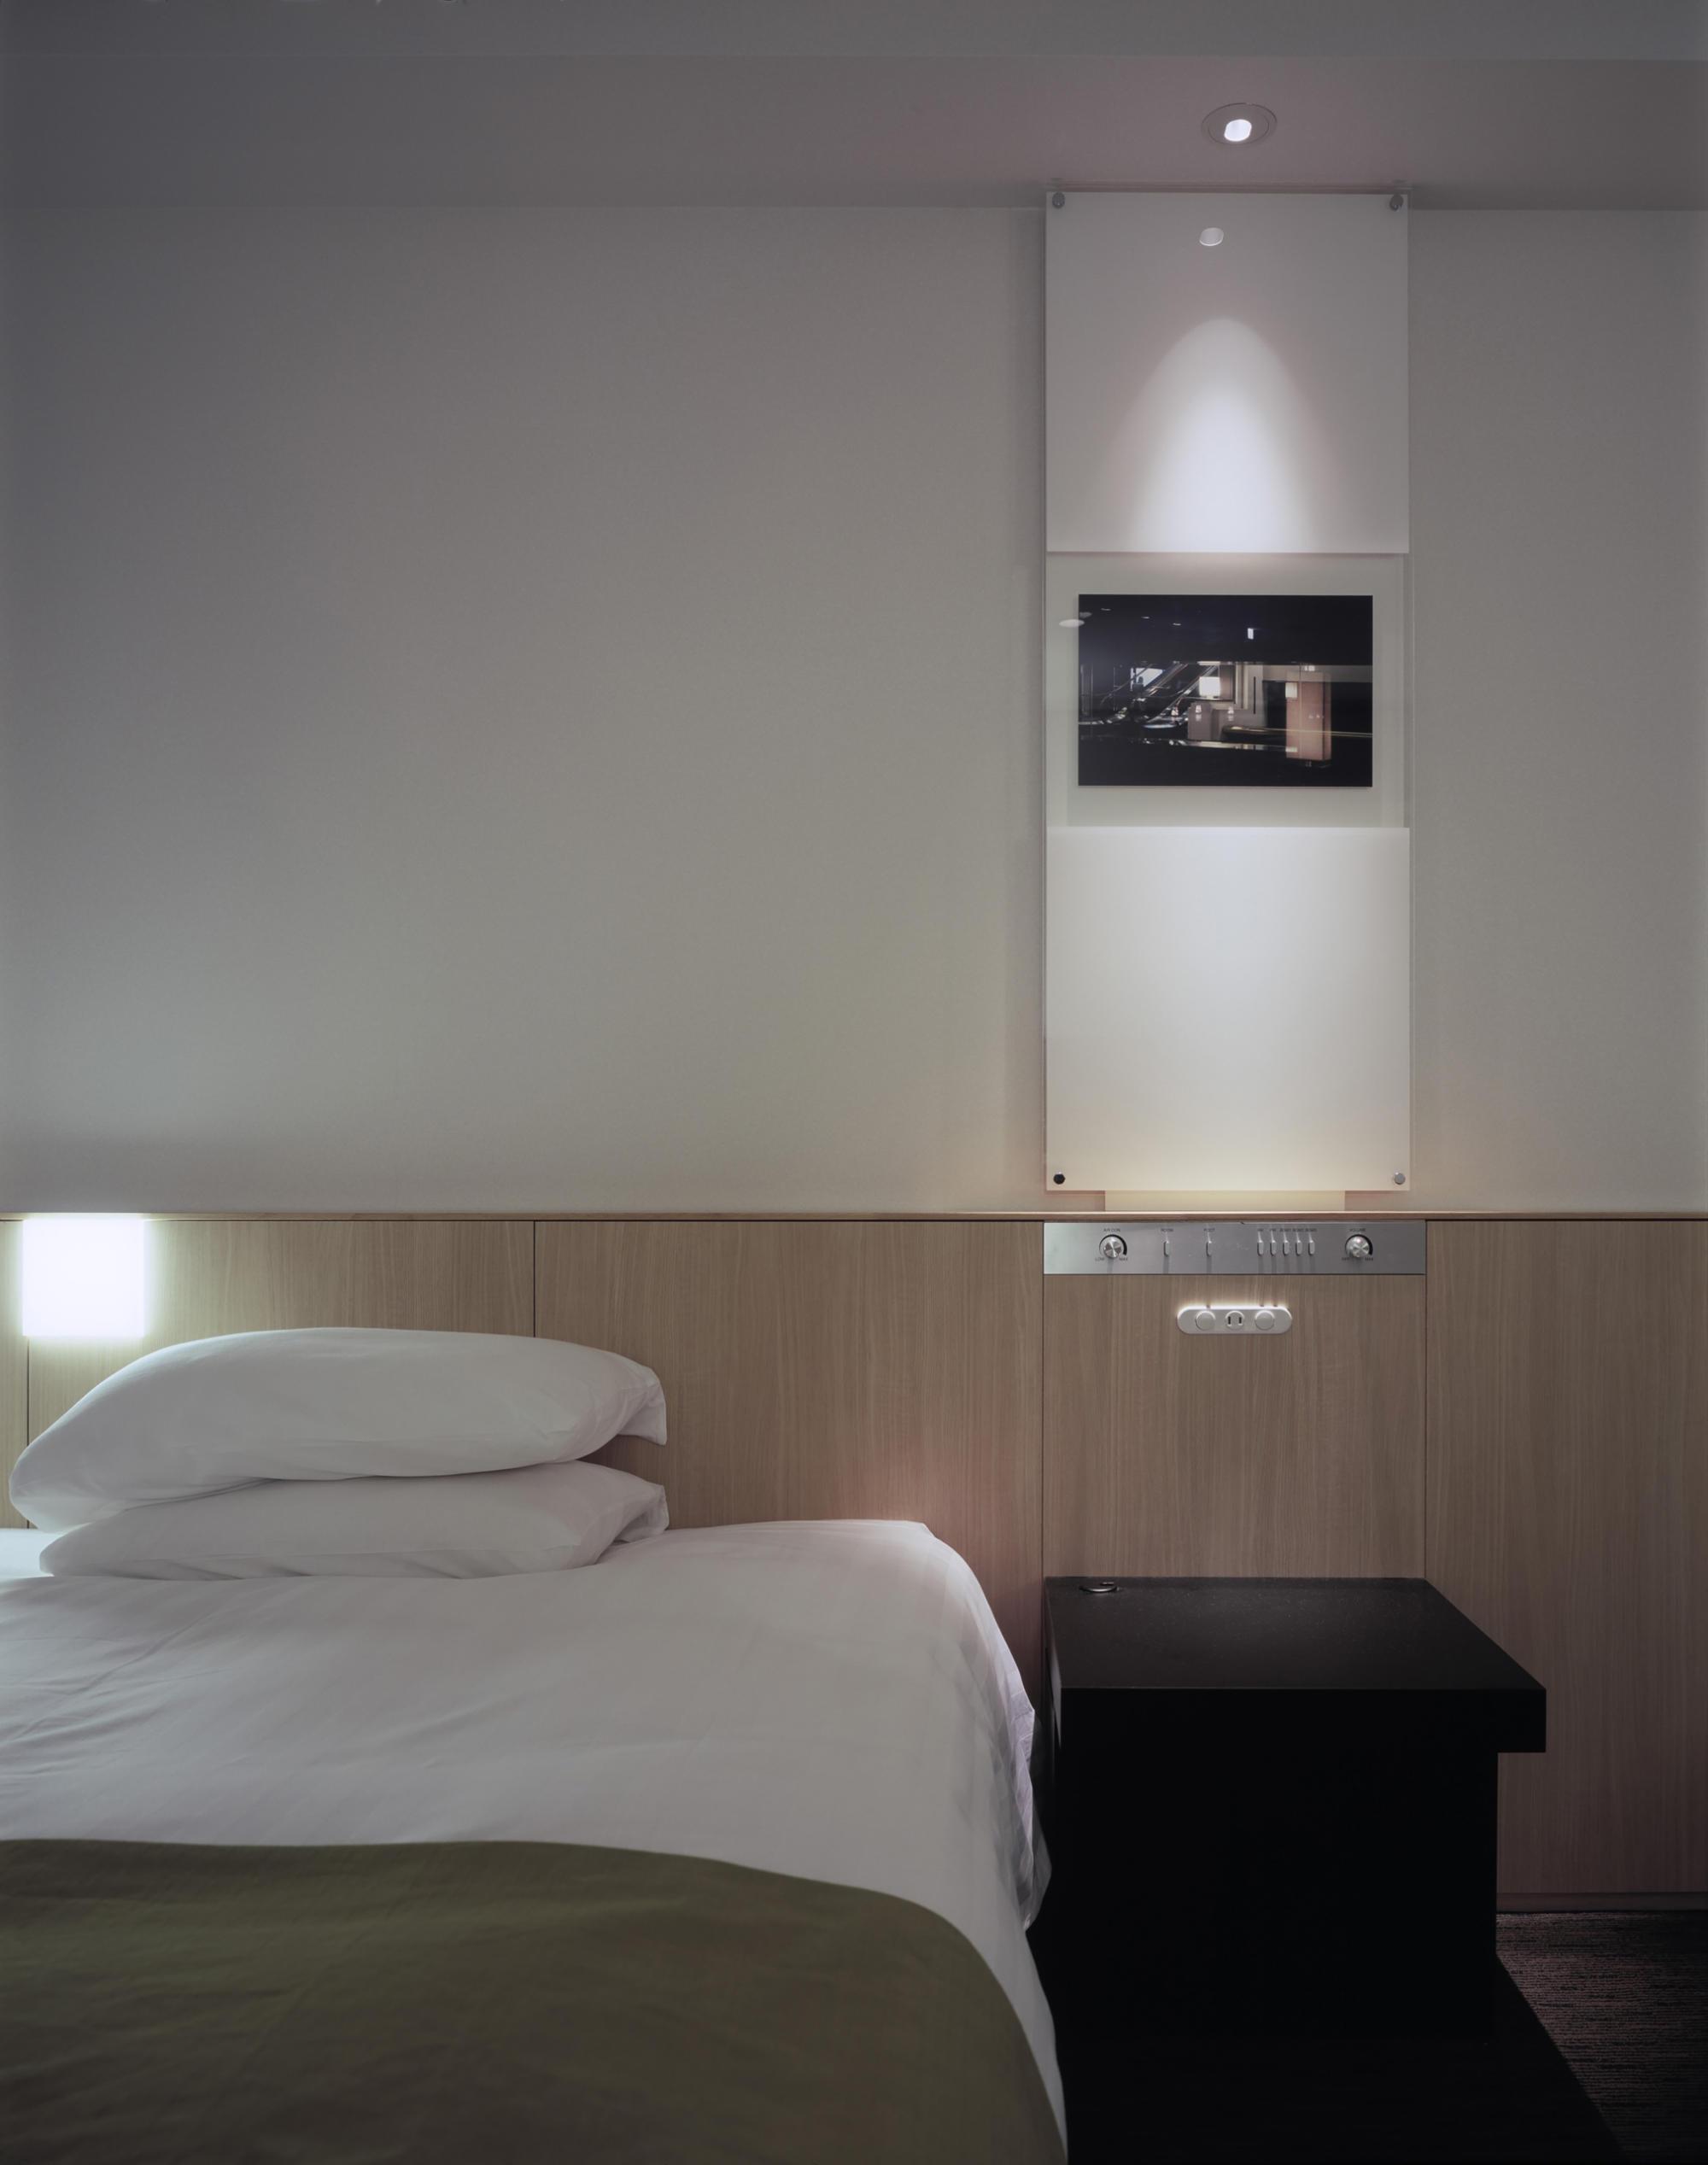 Kyoto Tokyu Hotel 2F&3F Room Renovation | WORKS |